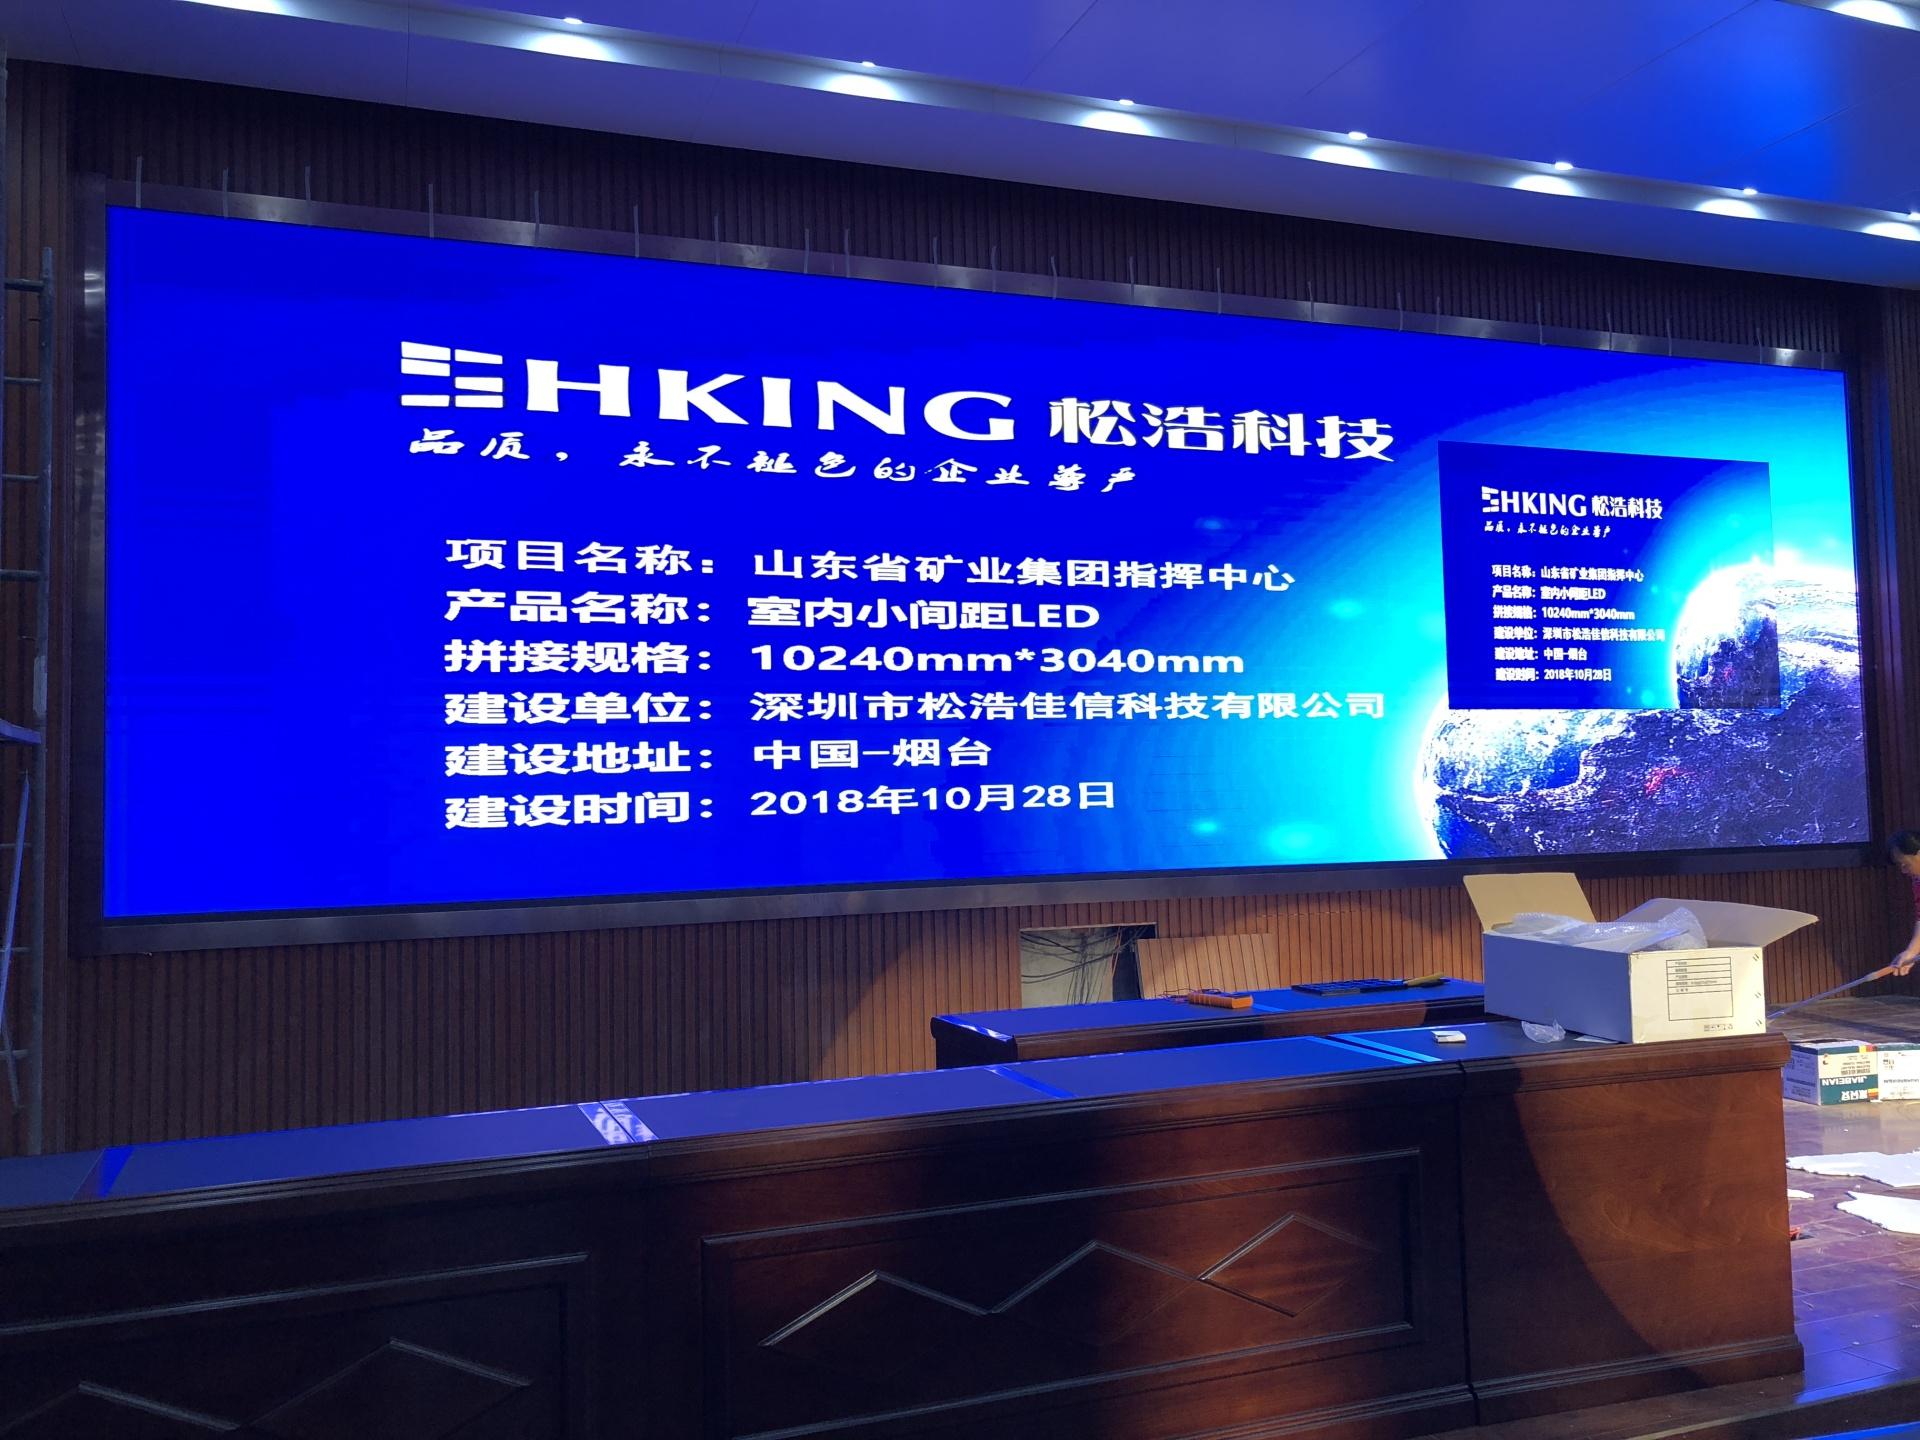 led小间距方案+_小间距led显示屏厂商_小间距led显示屏家买_深圳小间距led显示示例图7